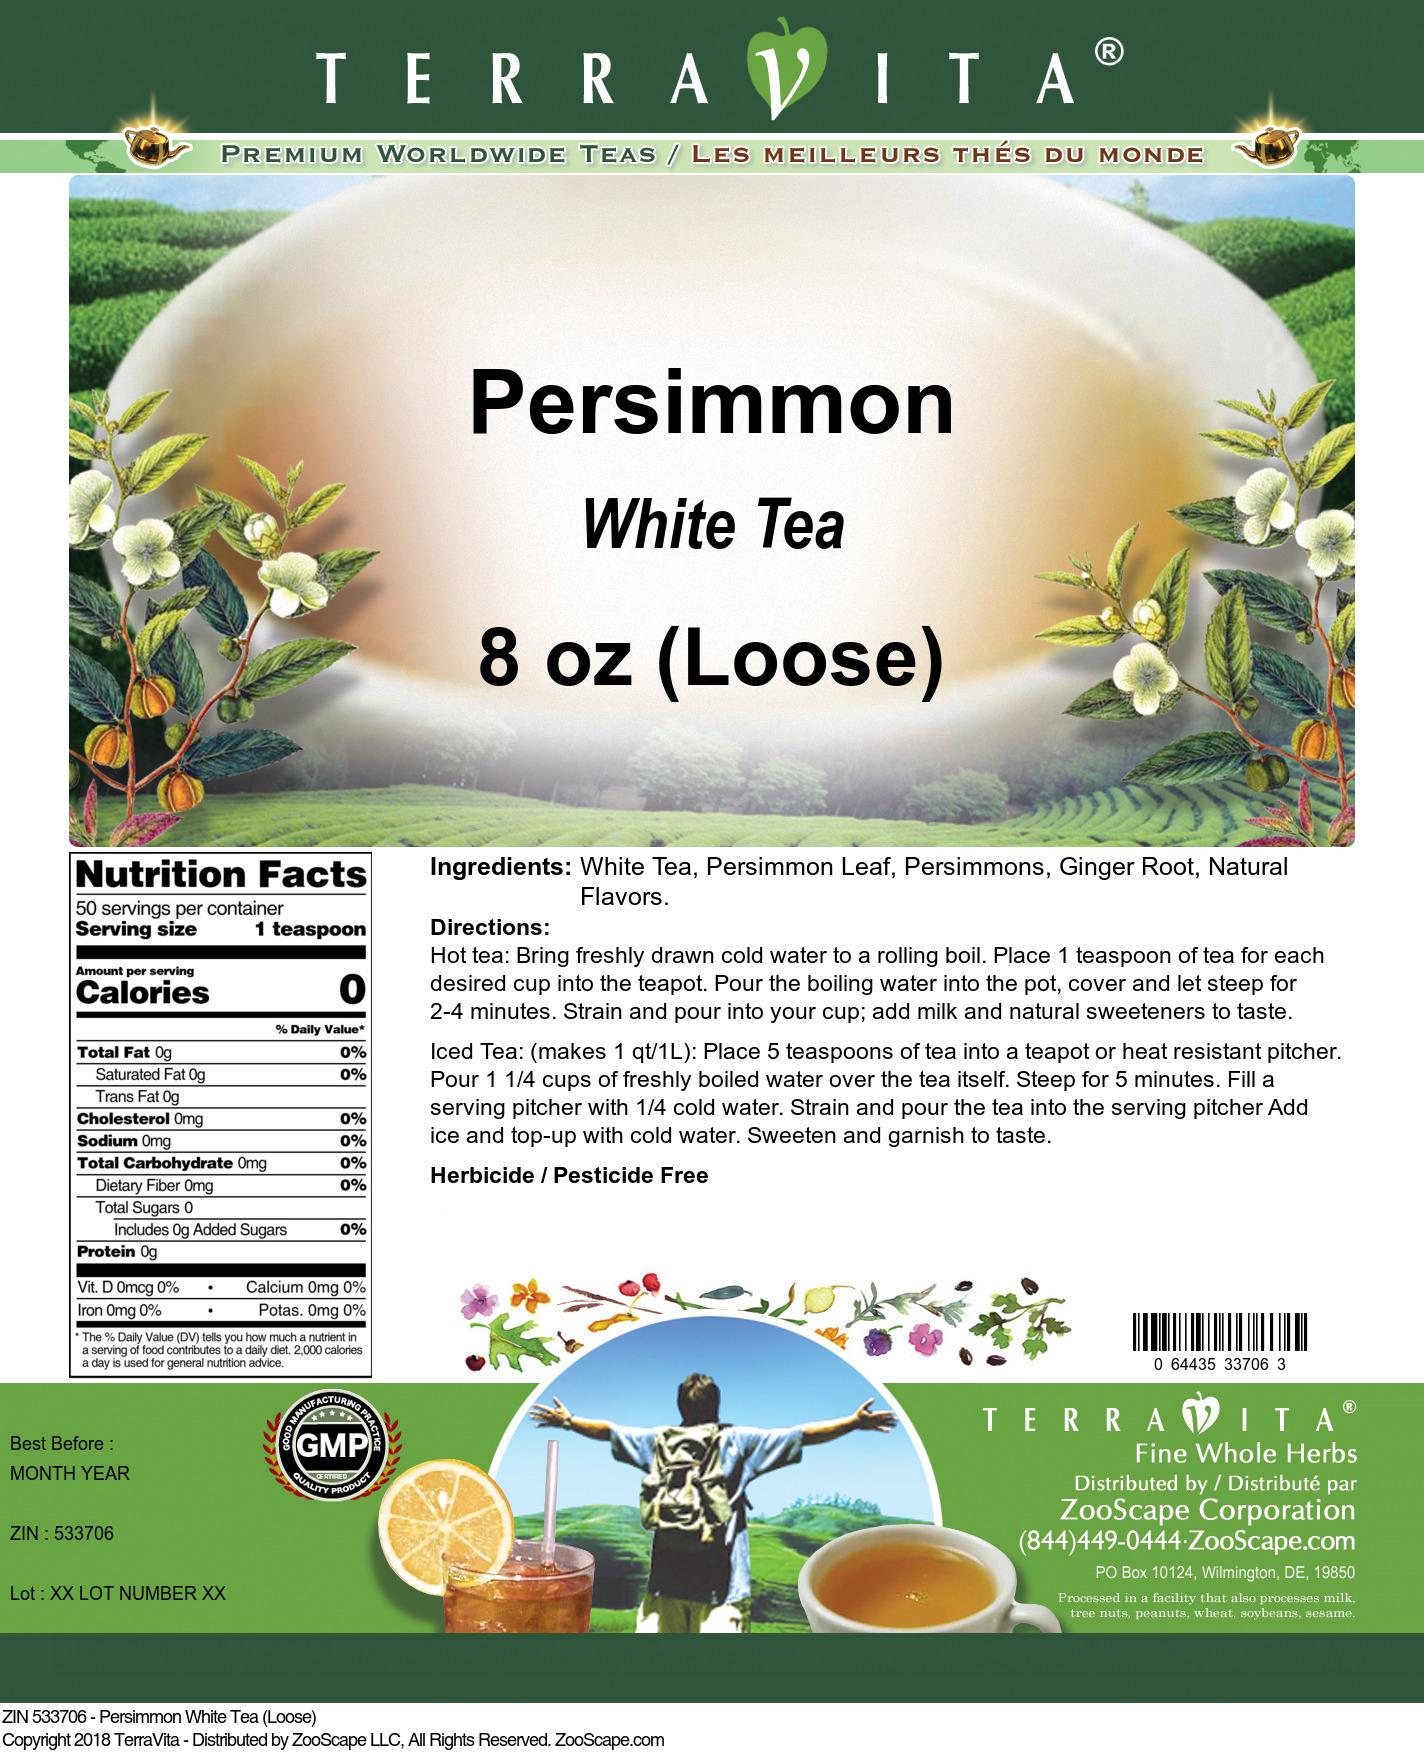 Persimmon White Tea (Loose)